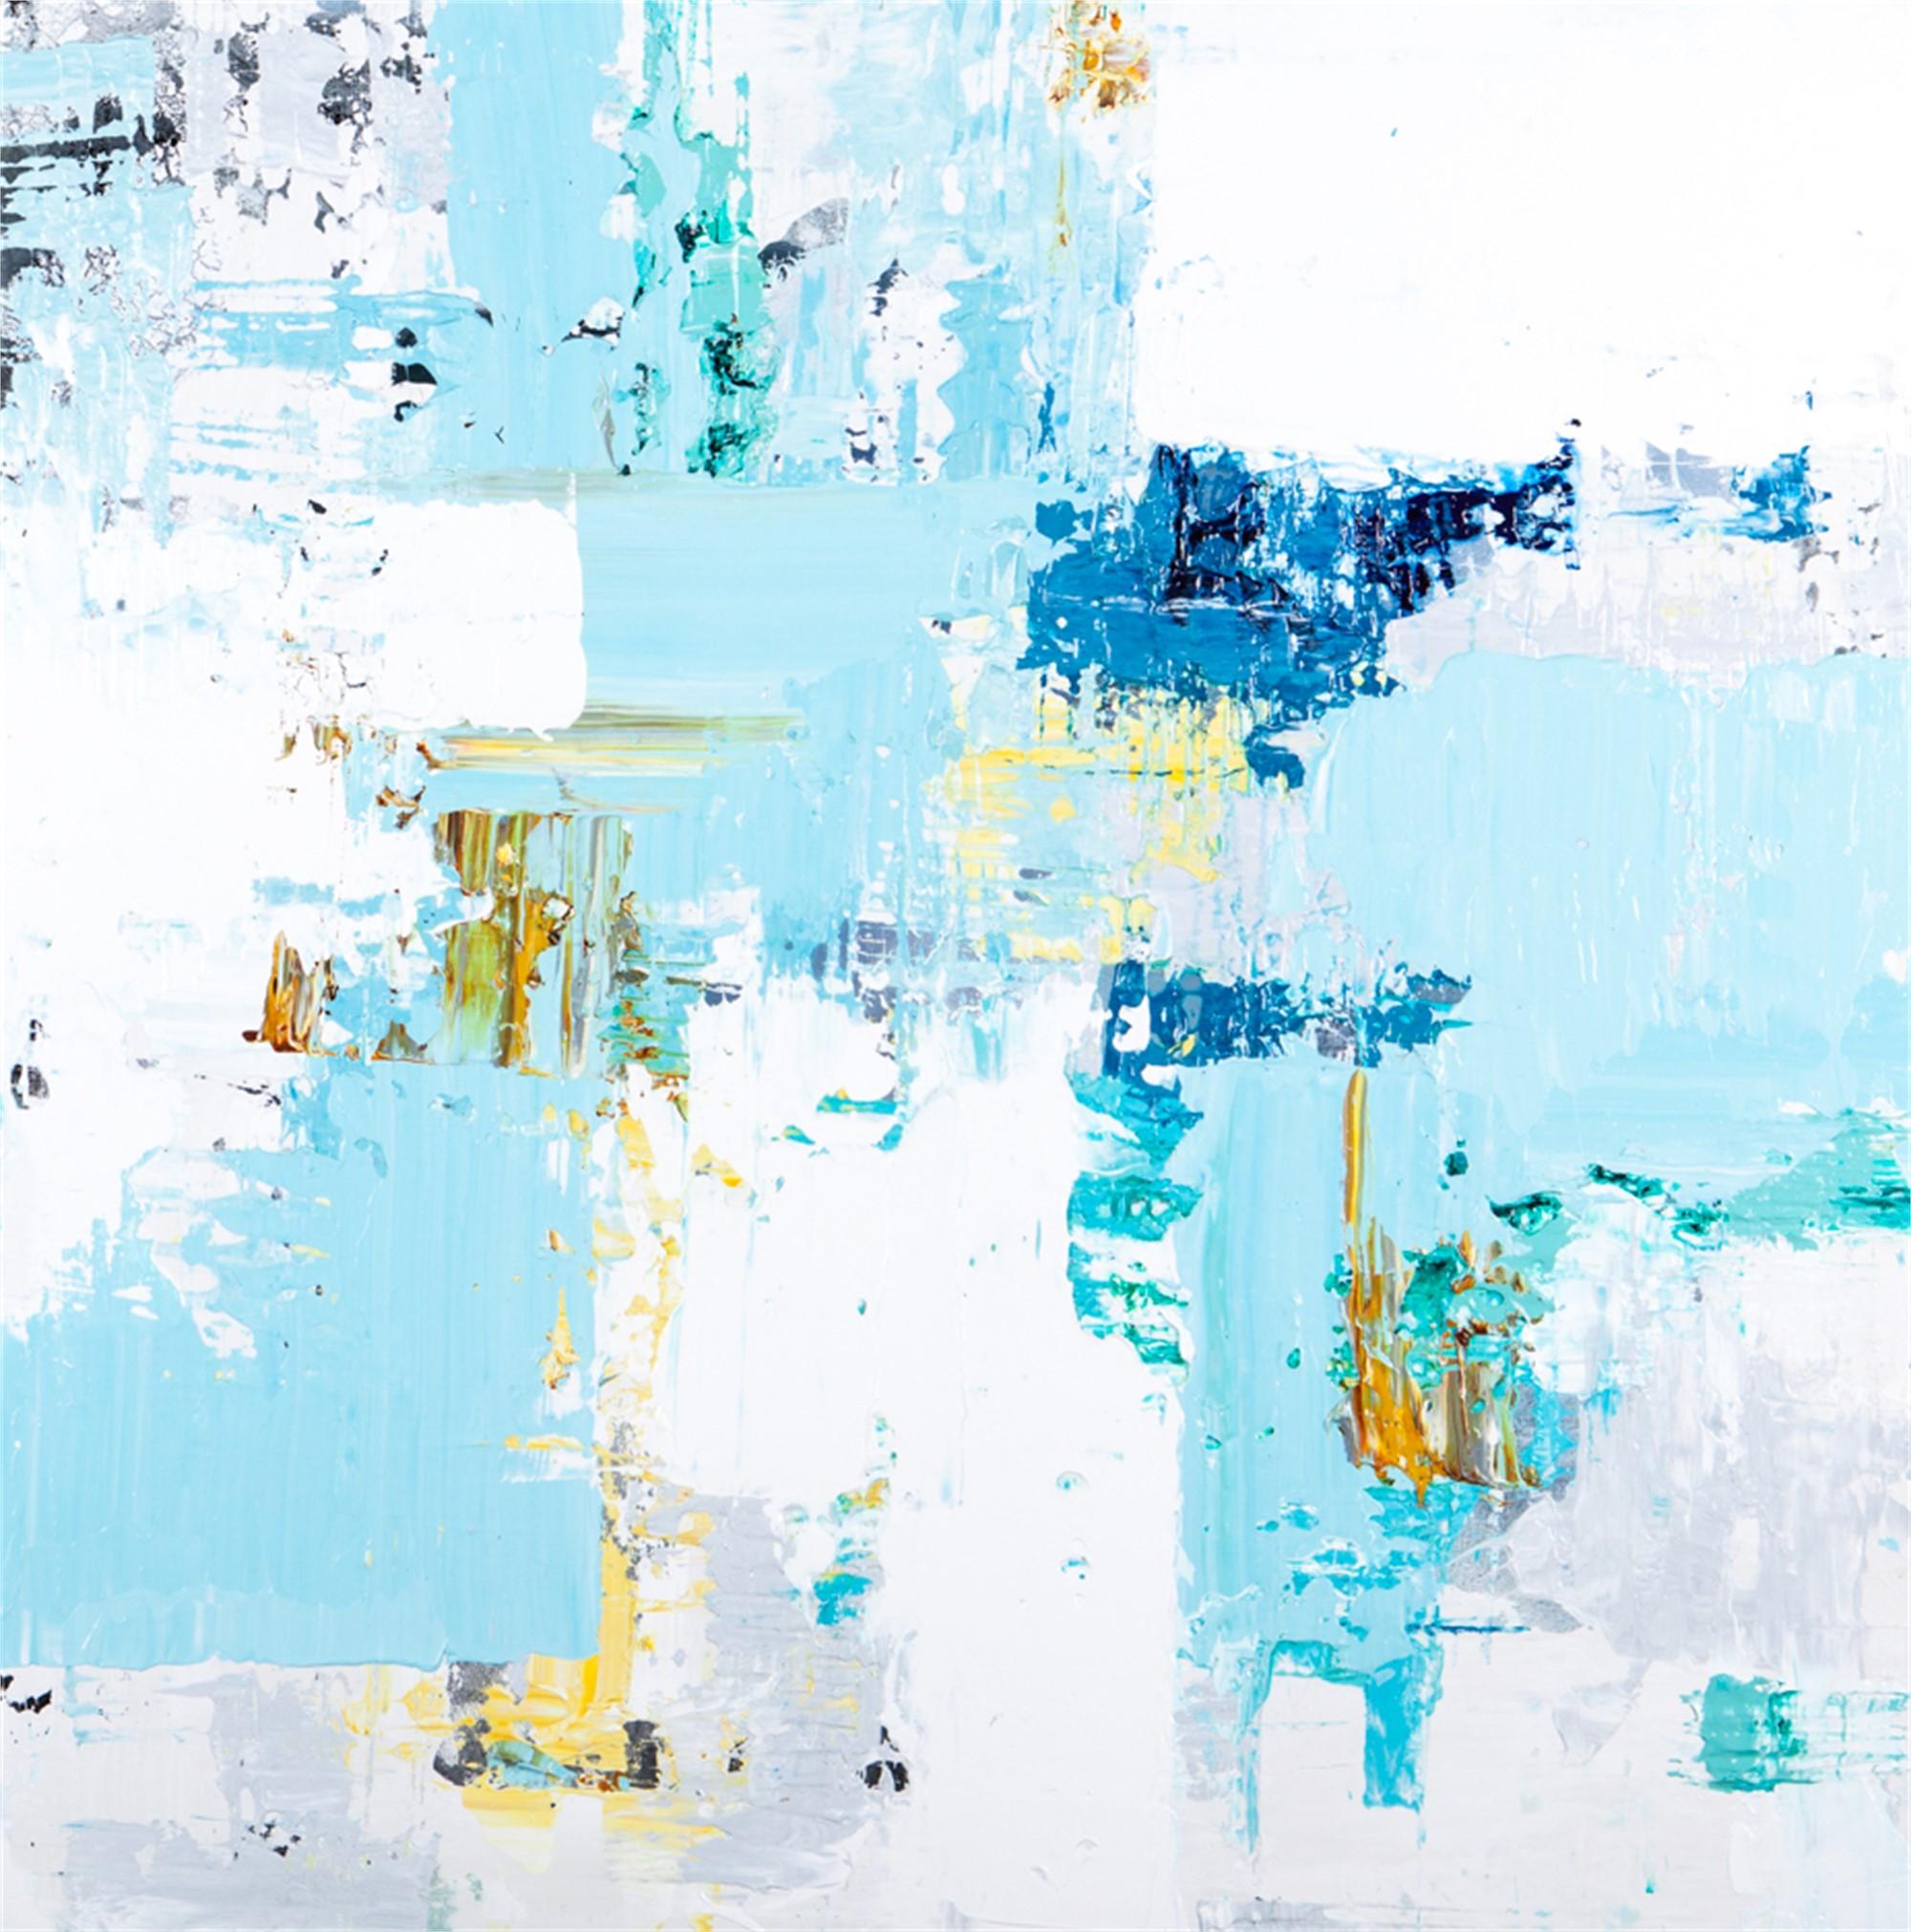 Visivo by John Schuyler